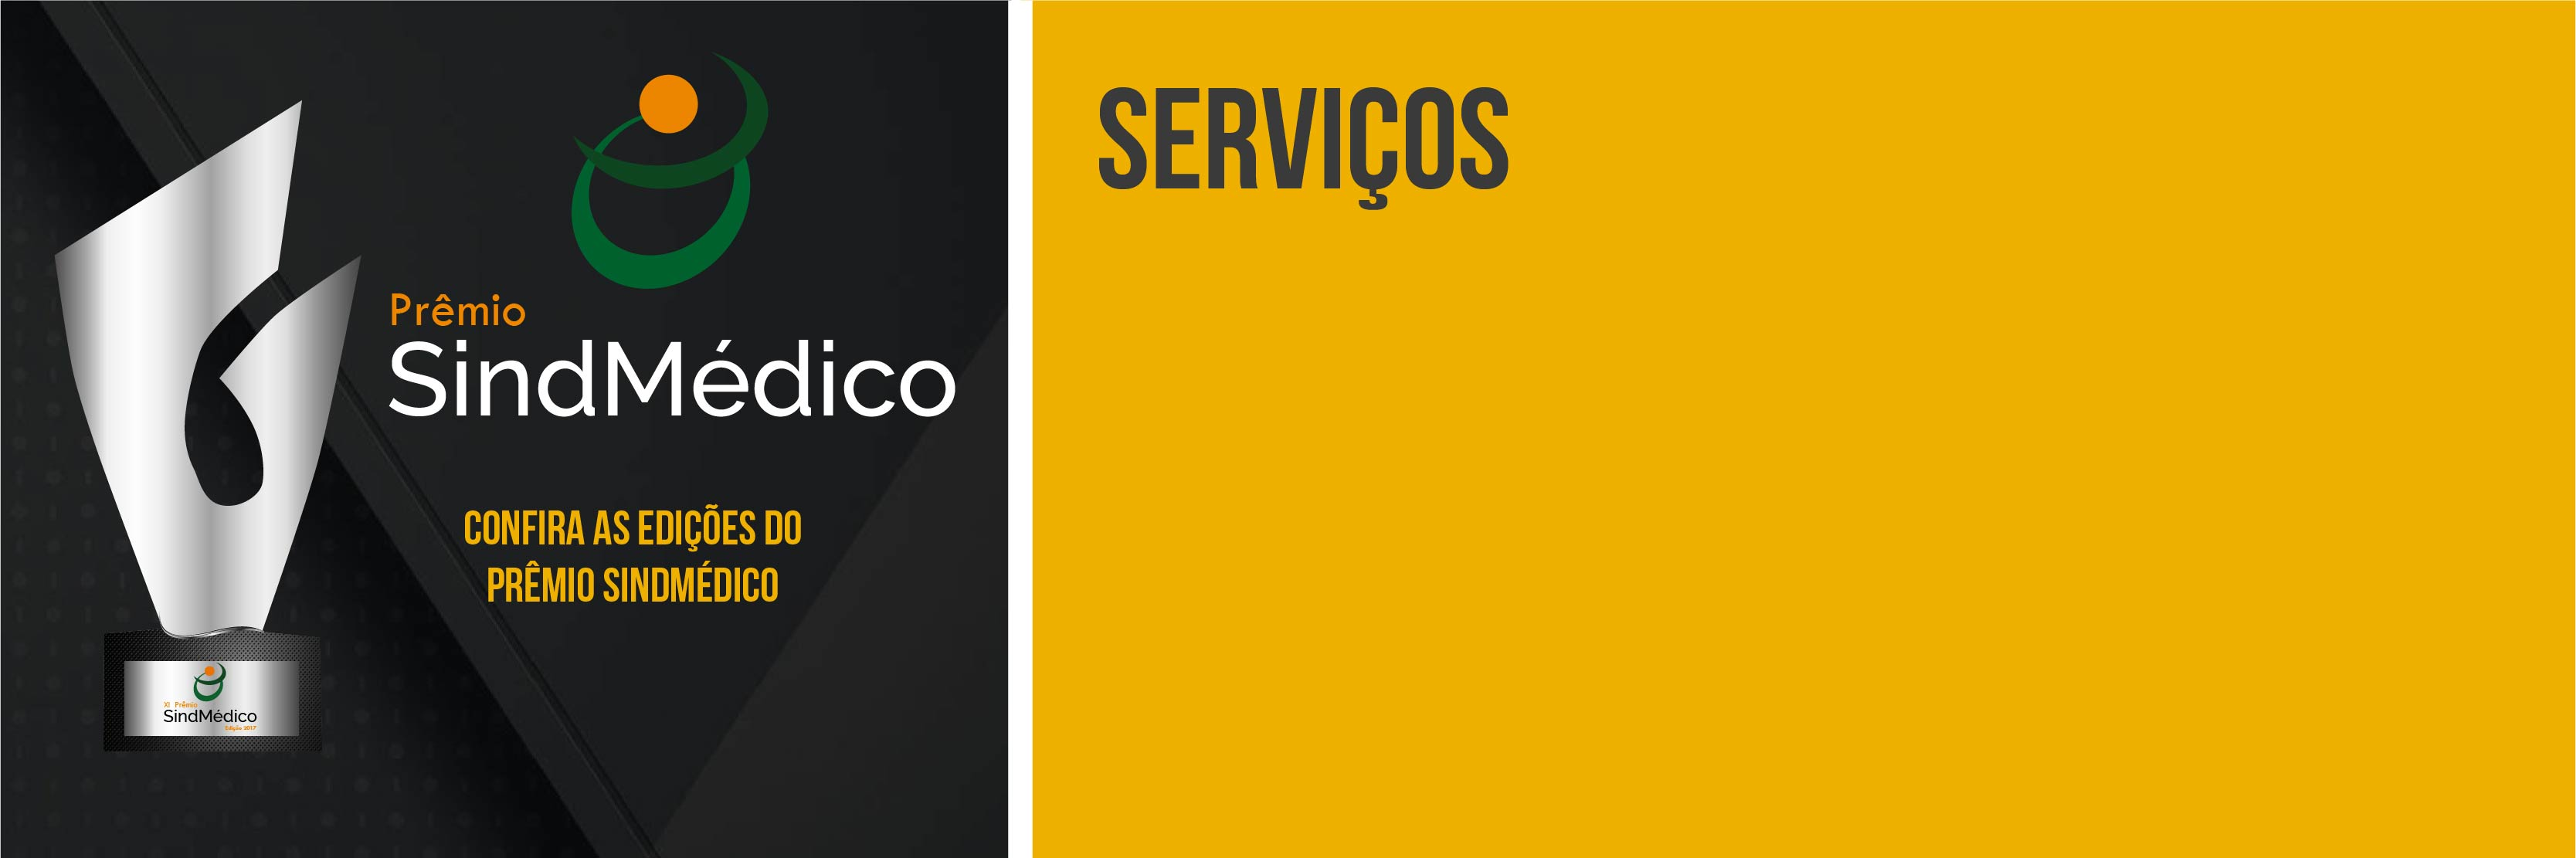 banner-premio-servicos